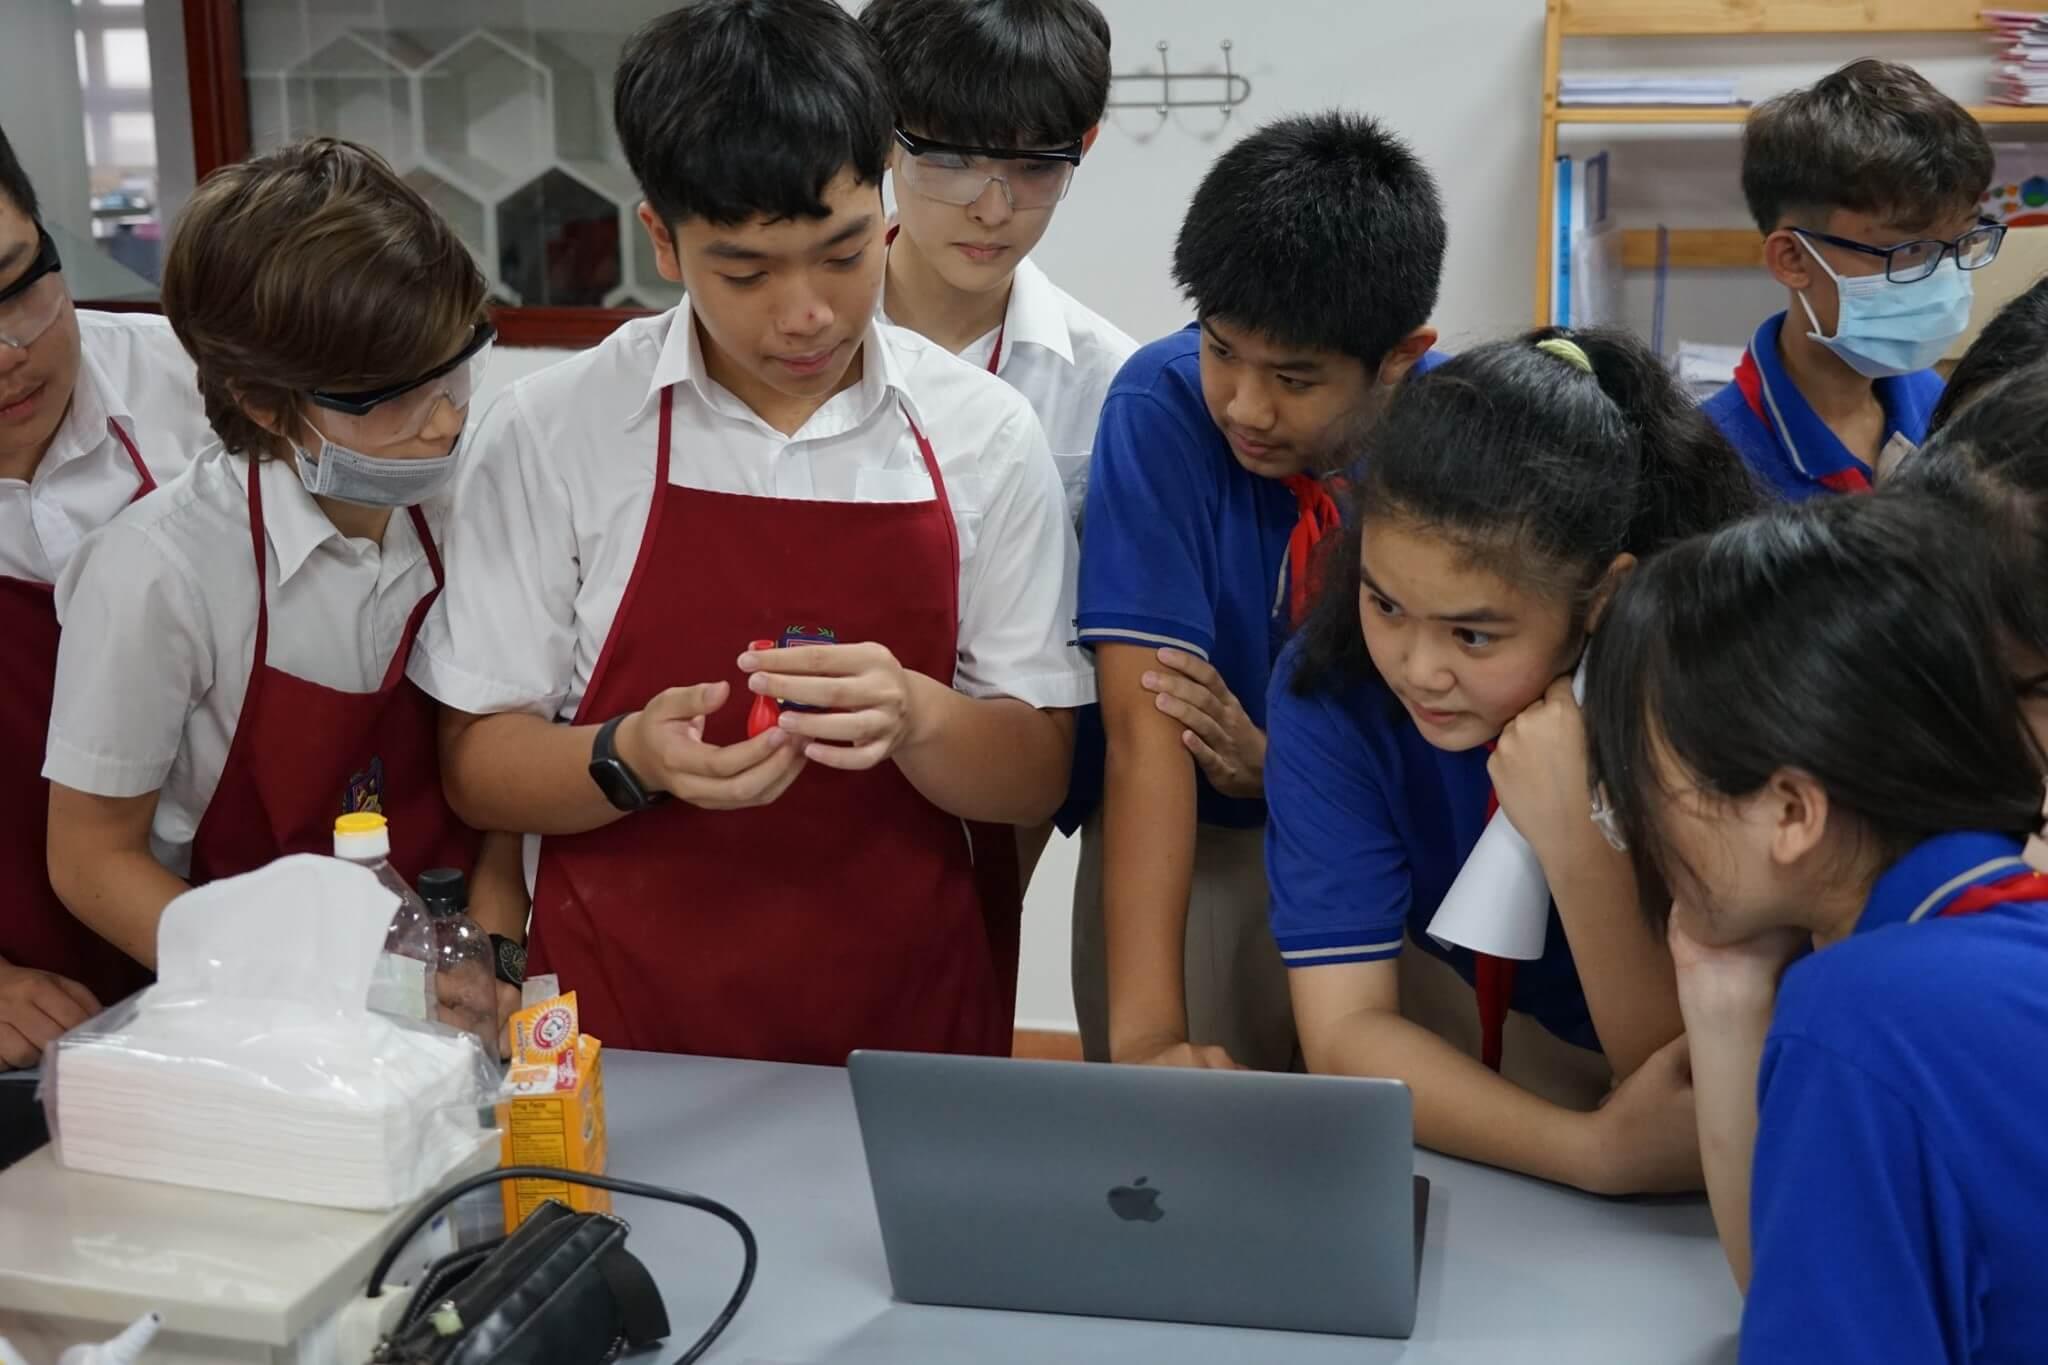 Schools in Asia